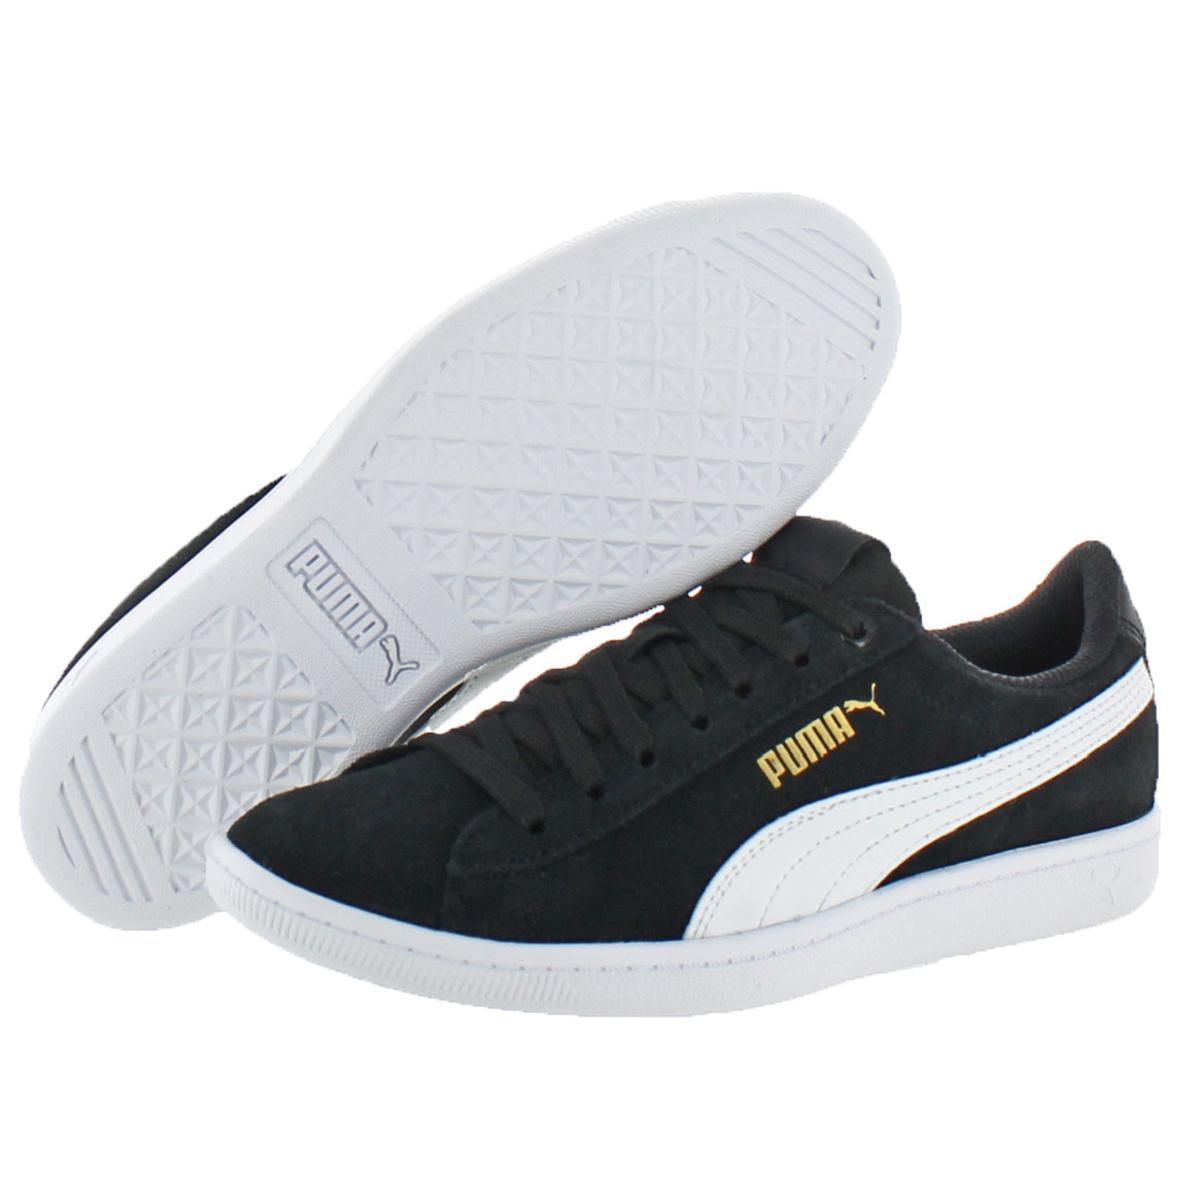 Puma-Vikky-Women-039-s-Suede-Softfoam-Court-Low-Top-Fashion-Sneaker-Shoes